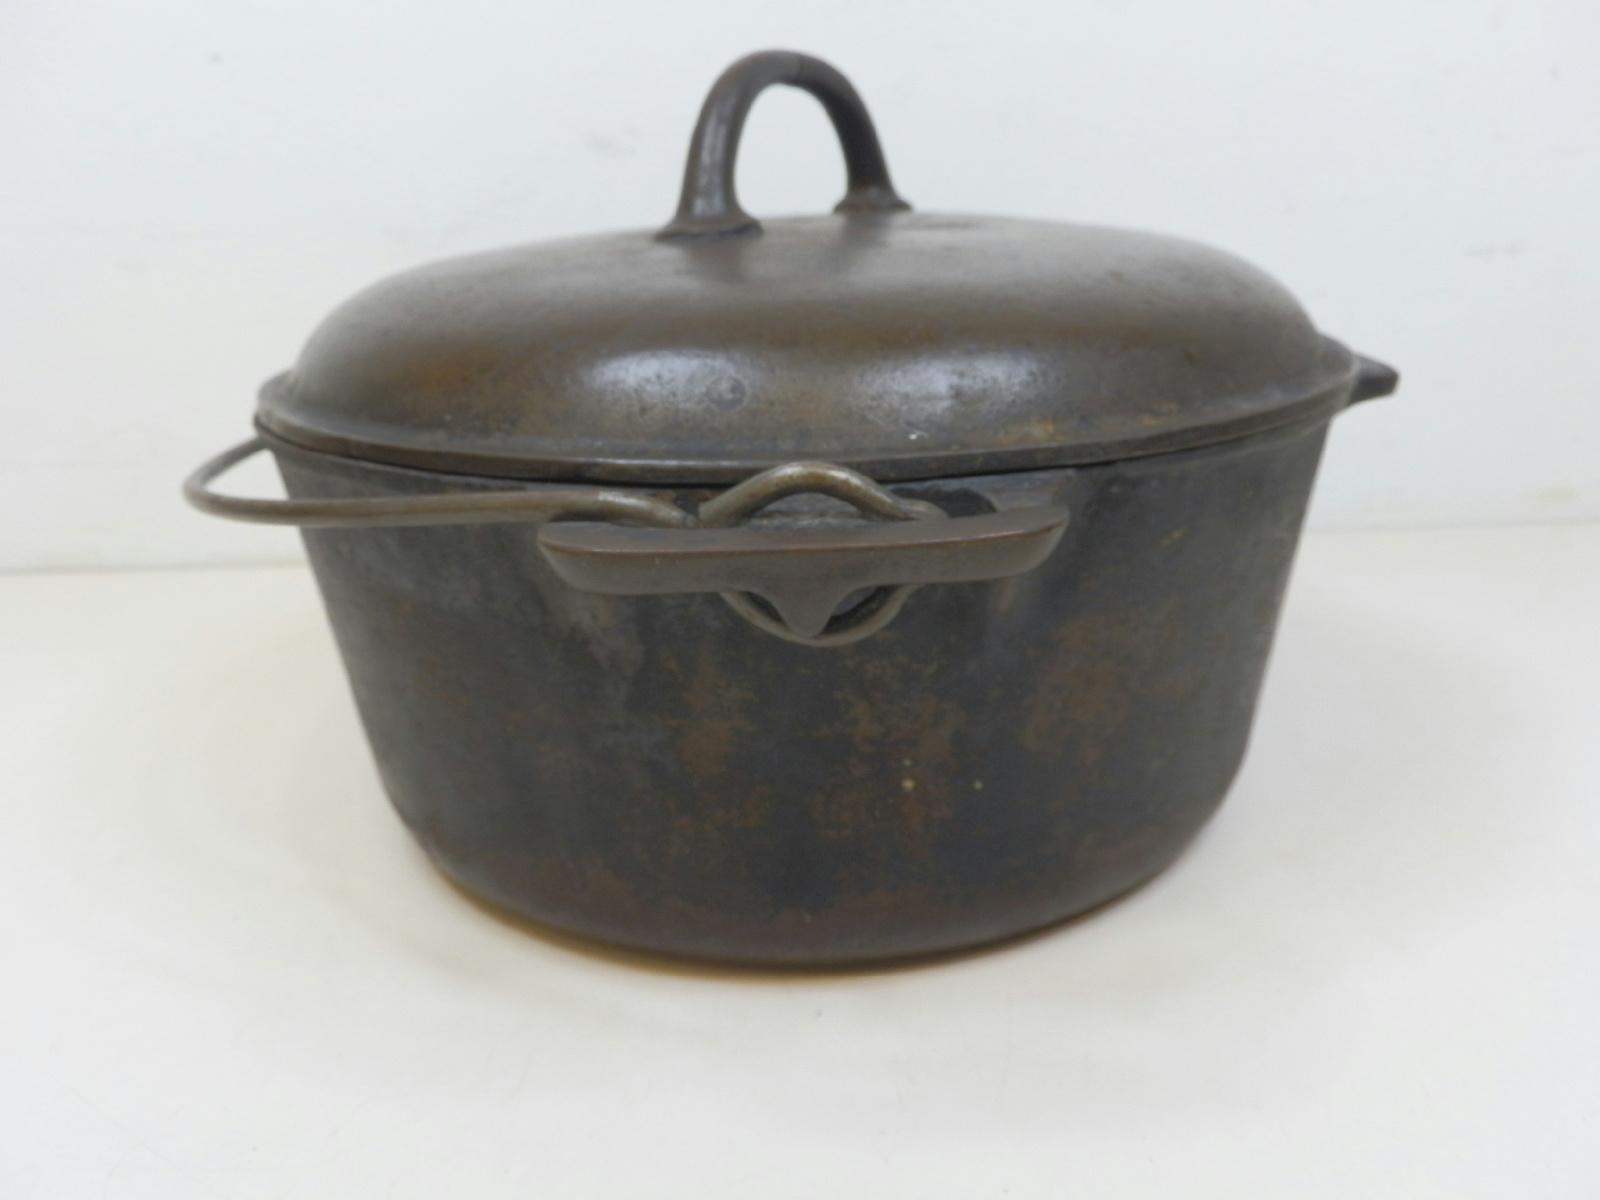 griswold cast iron 7 2503 dutch oven pot w lid ebay. Black Bedroom Furniture Sets. Home Design Ideas